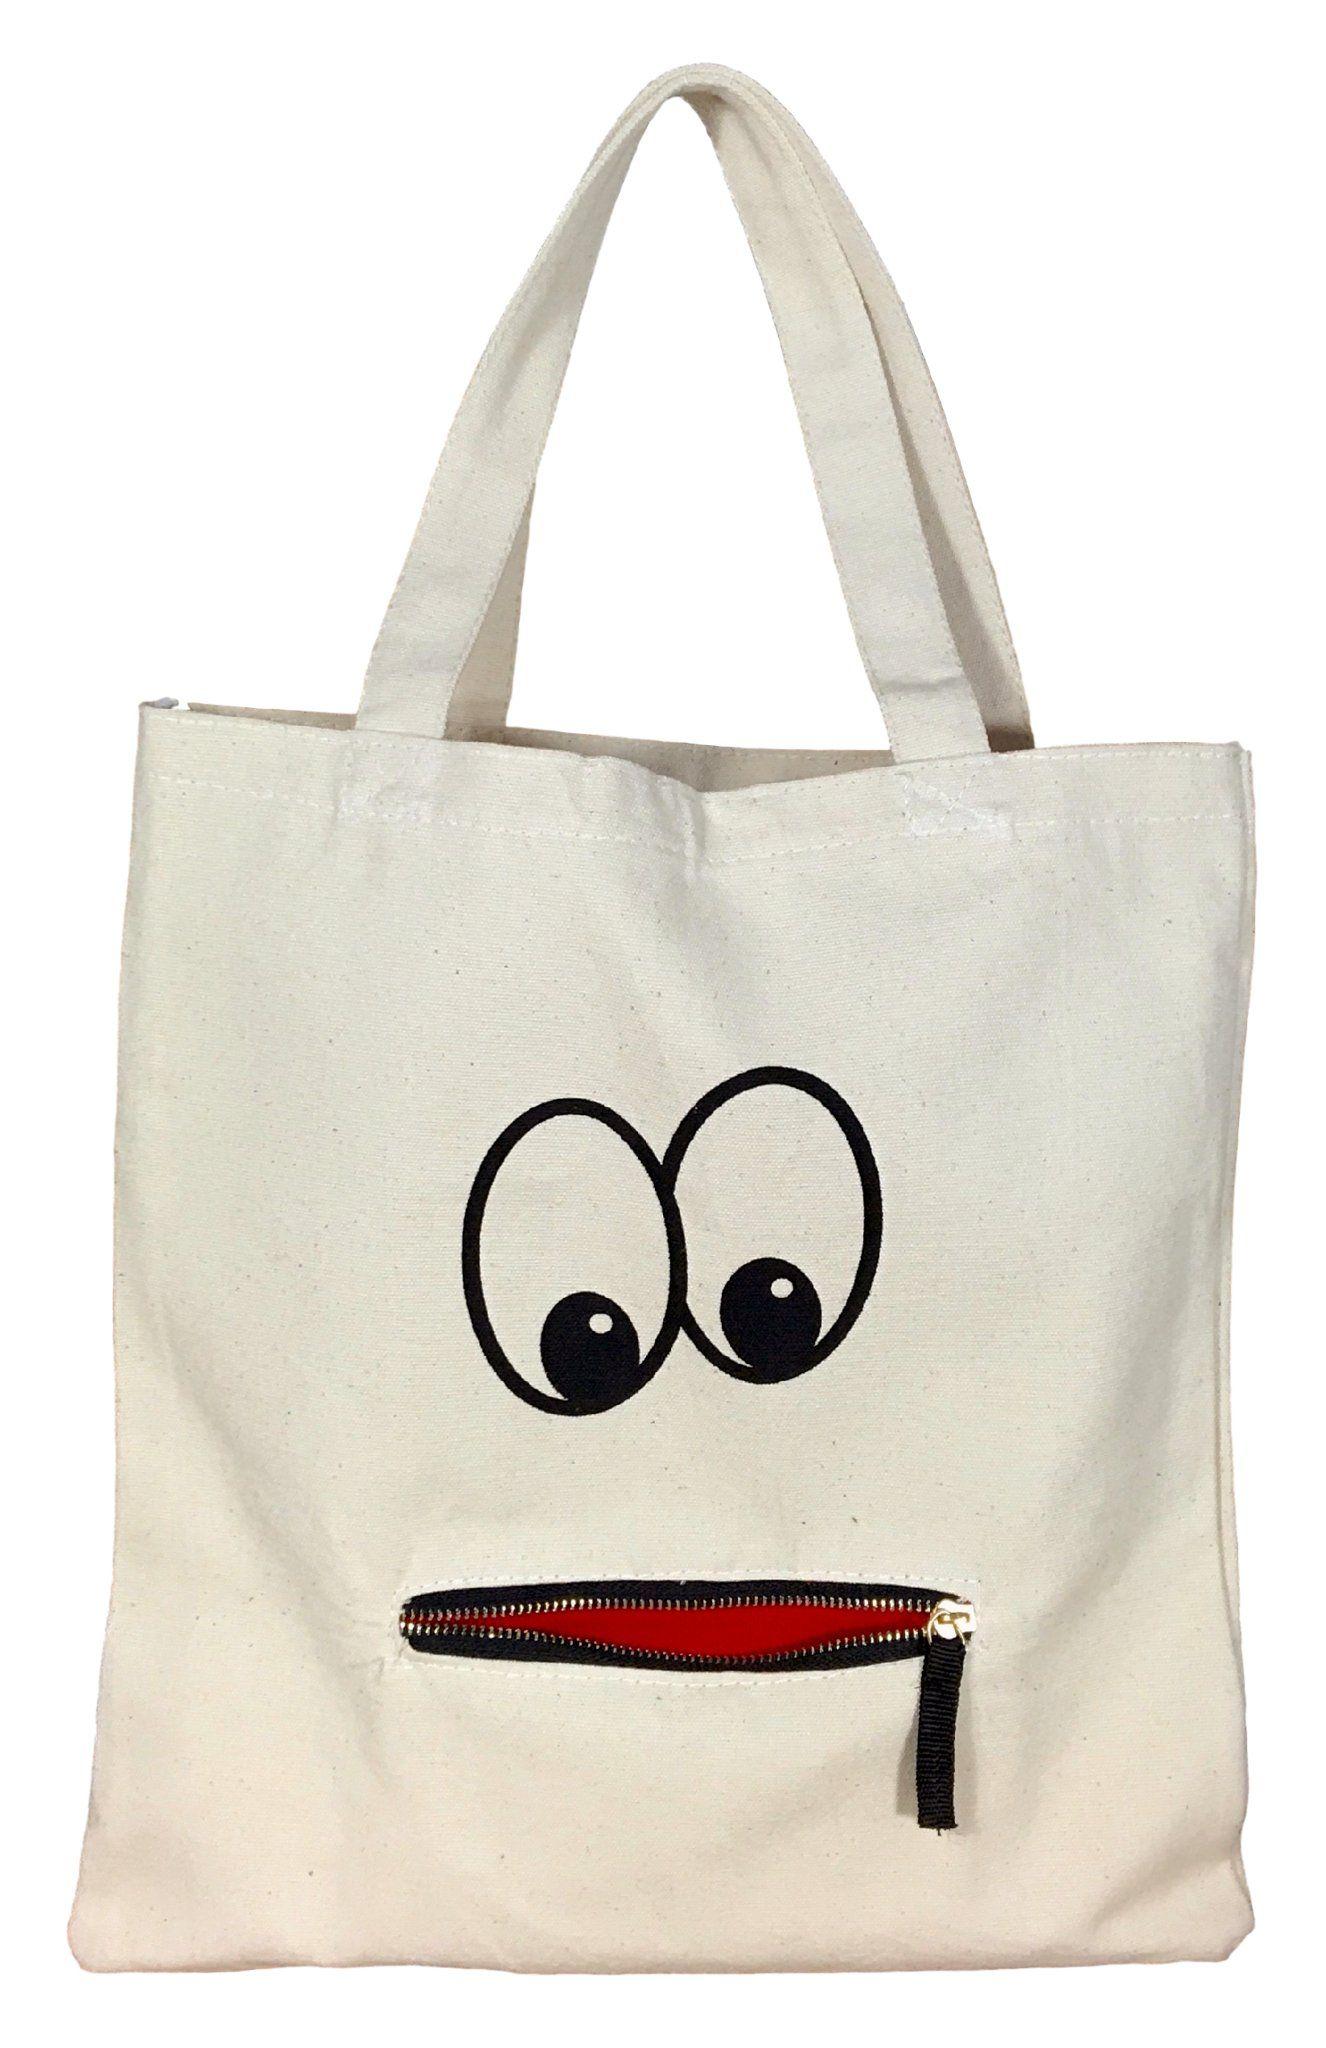 b41c1e01852 Googly Eye Zipper Tote | Craft ideas | Bags, Cloth bags, Tote bags ...